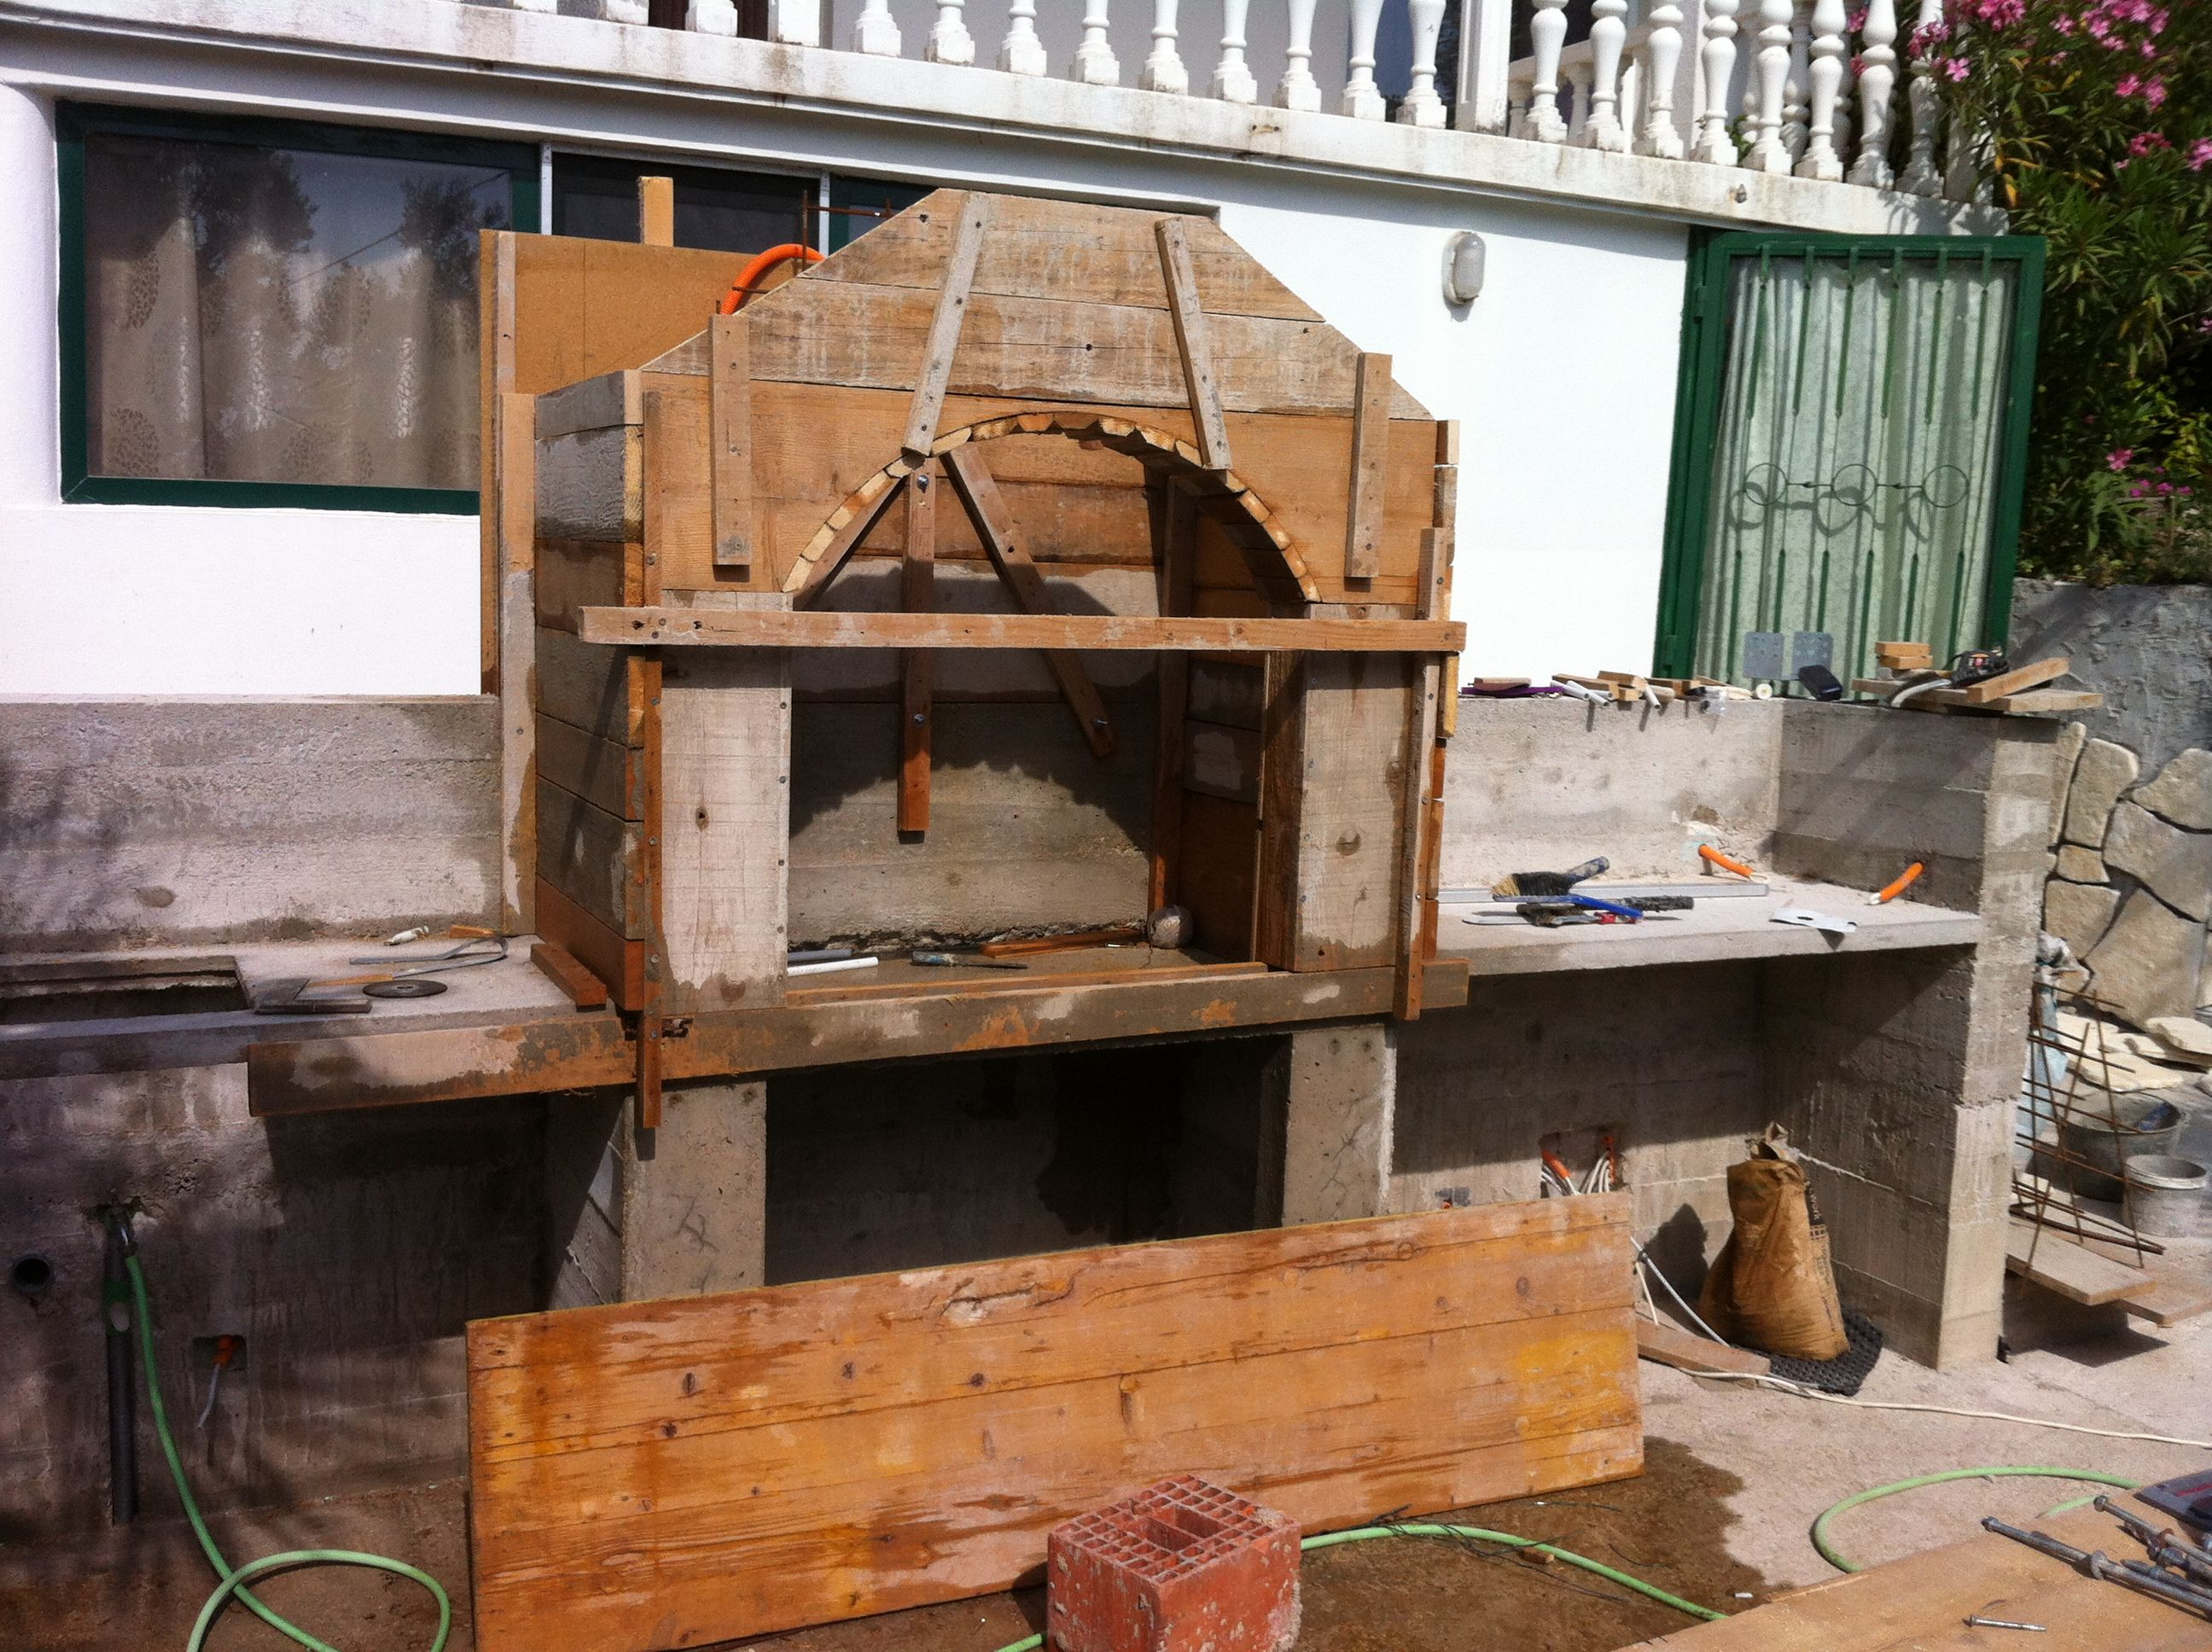 bin am grill dran | pavillon selber bauen | pinterest | pavillon